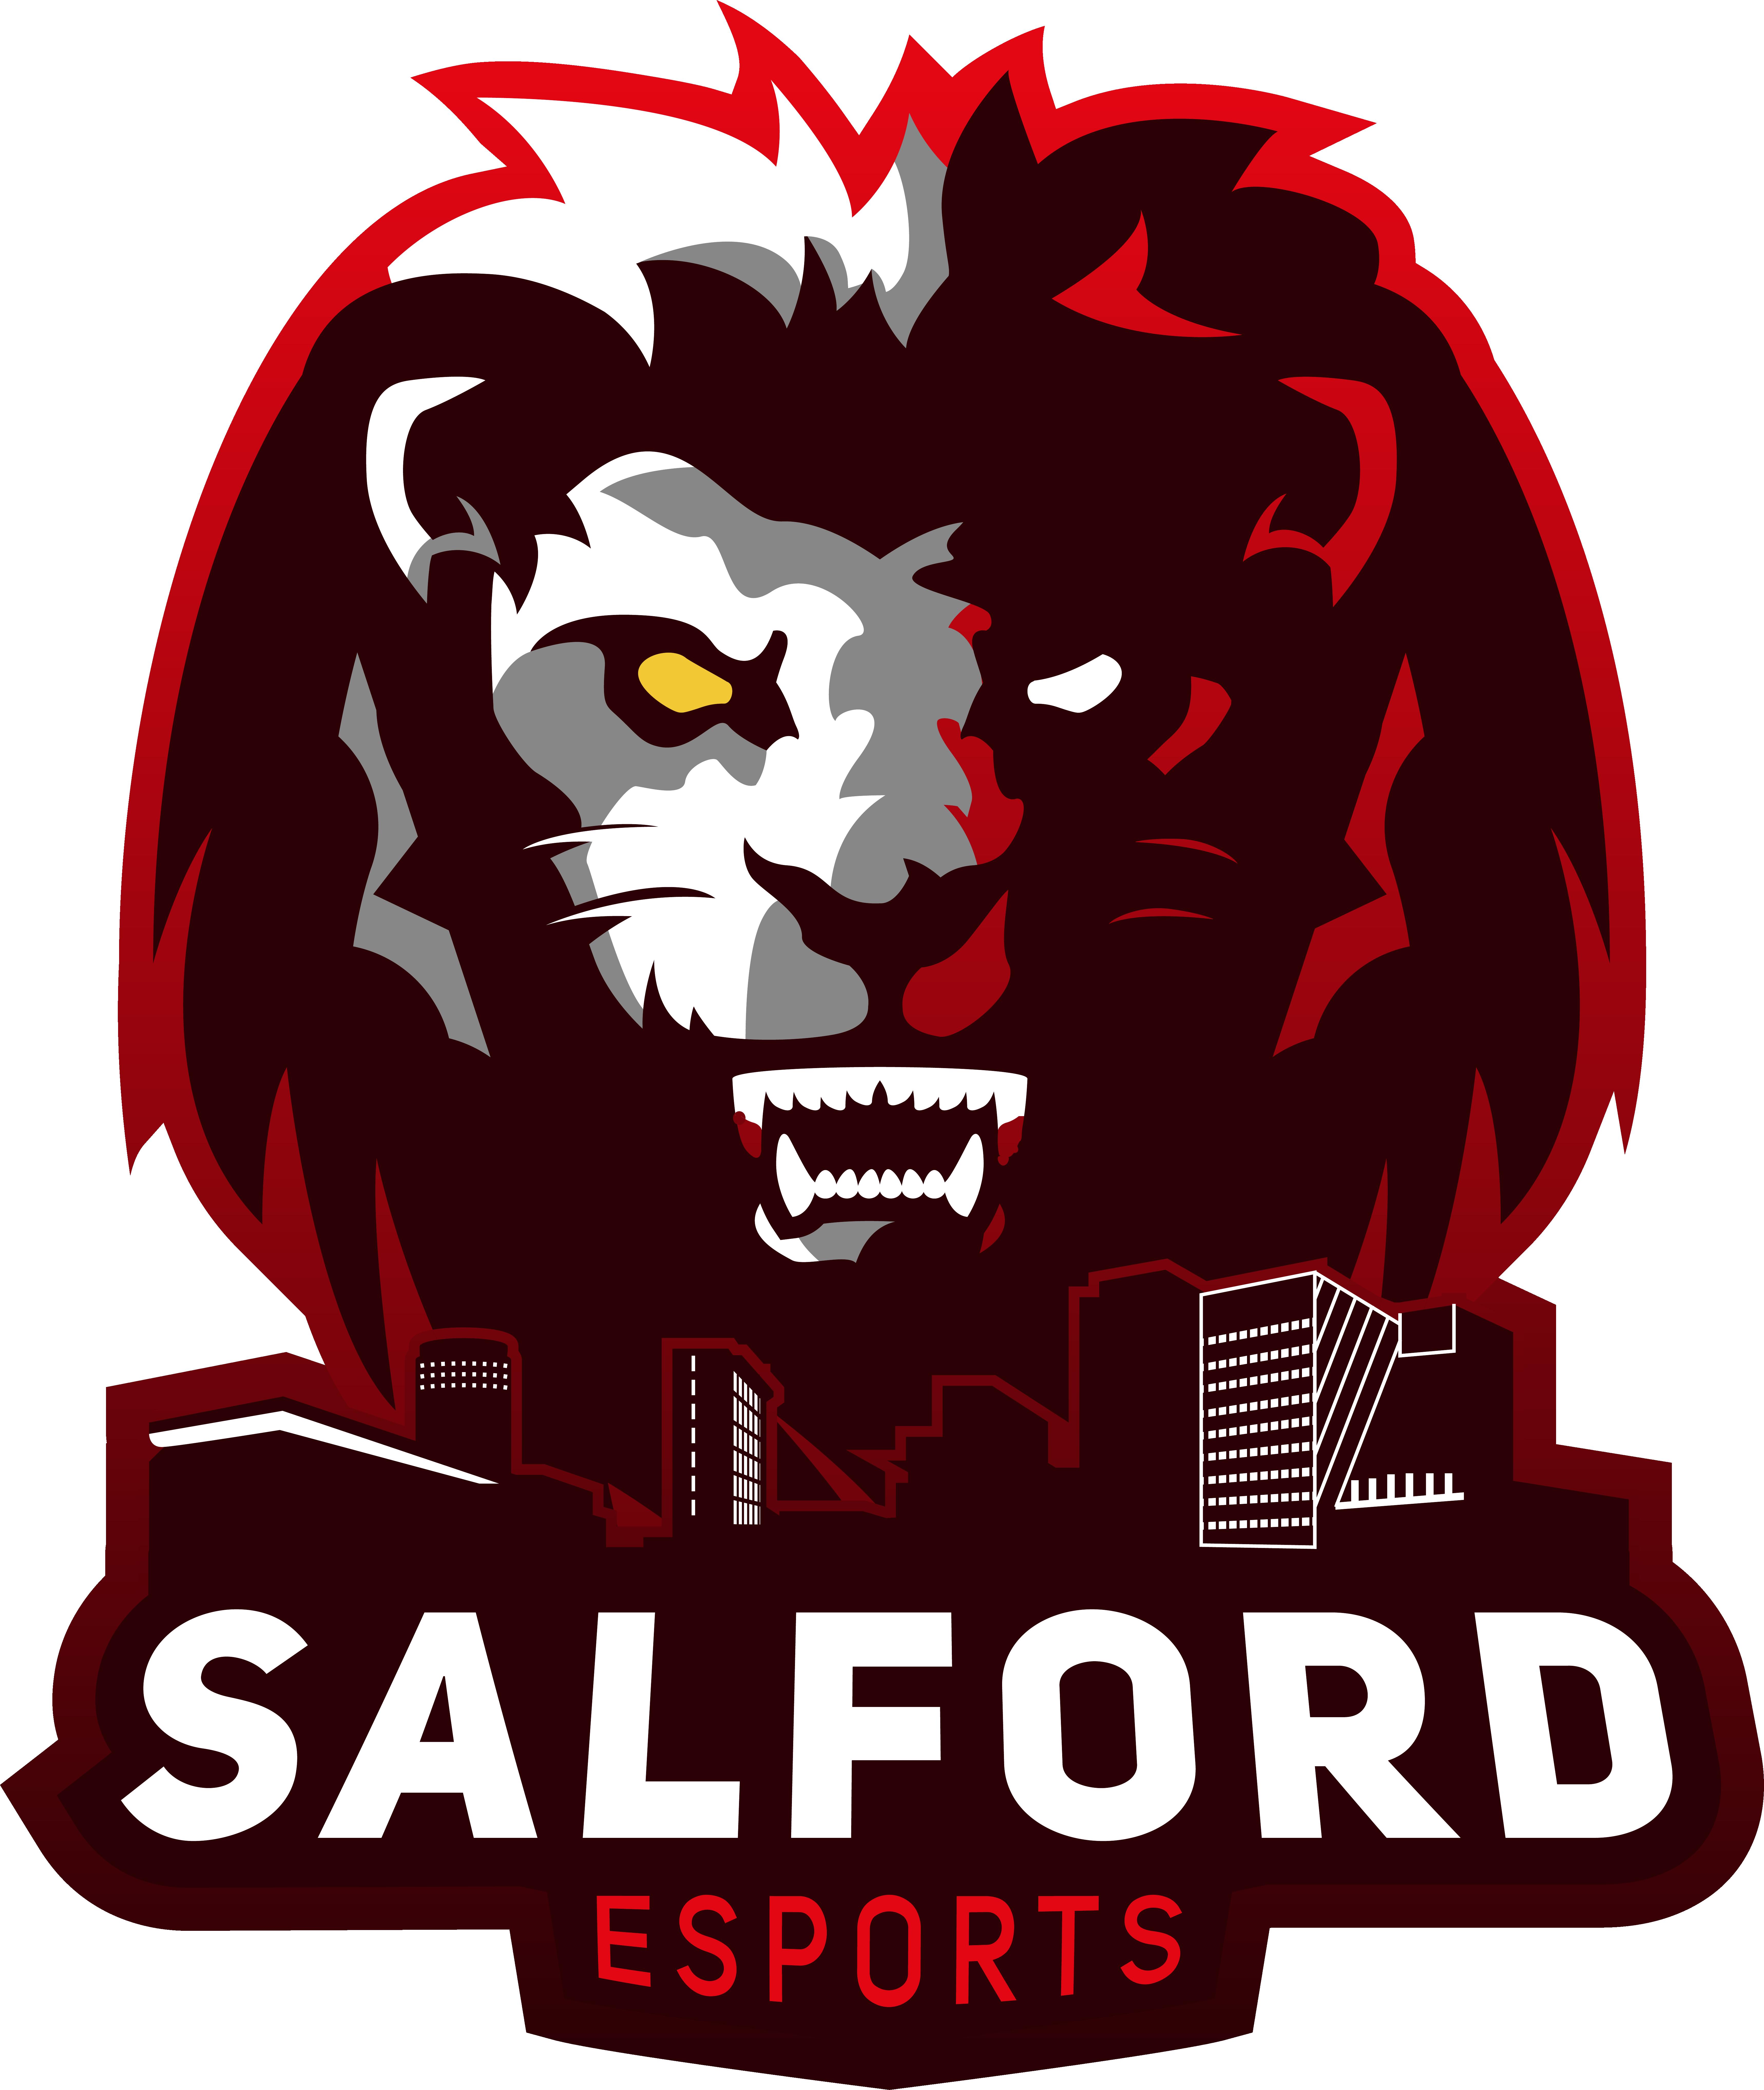 Salford Esports Society